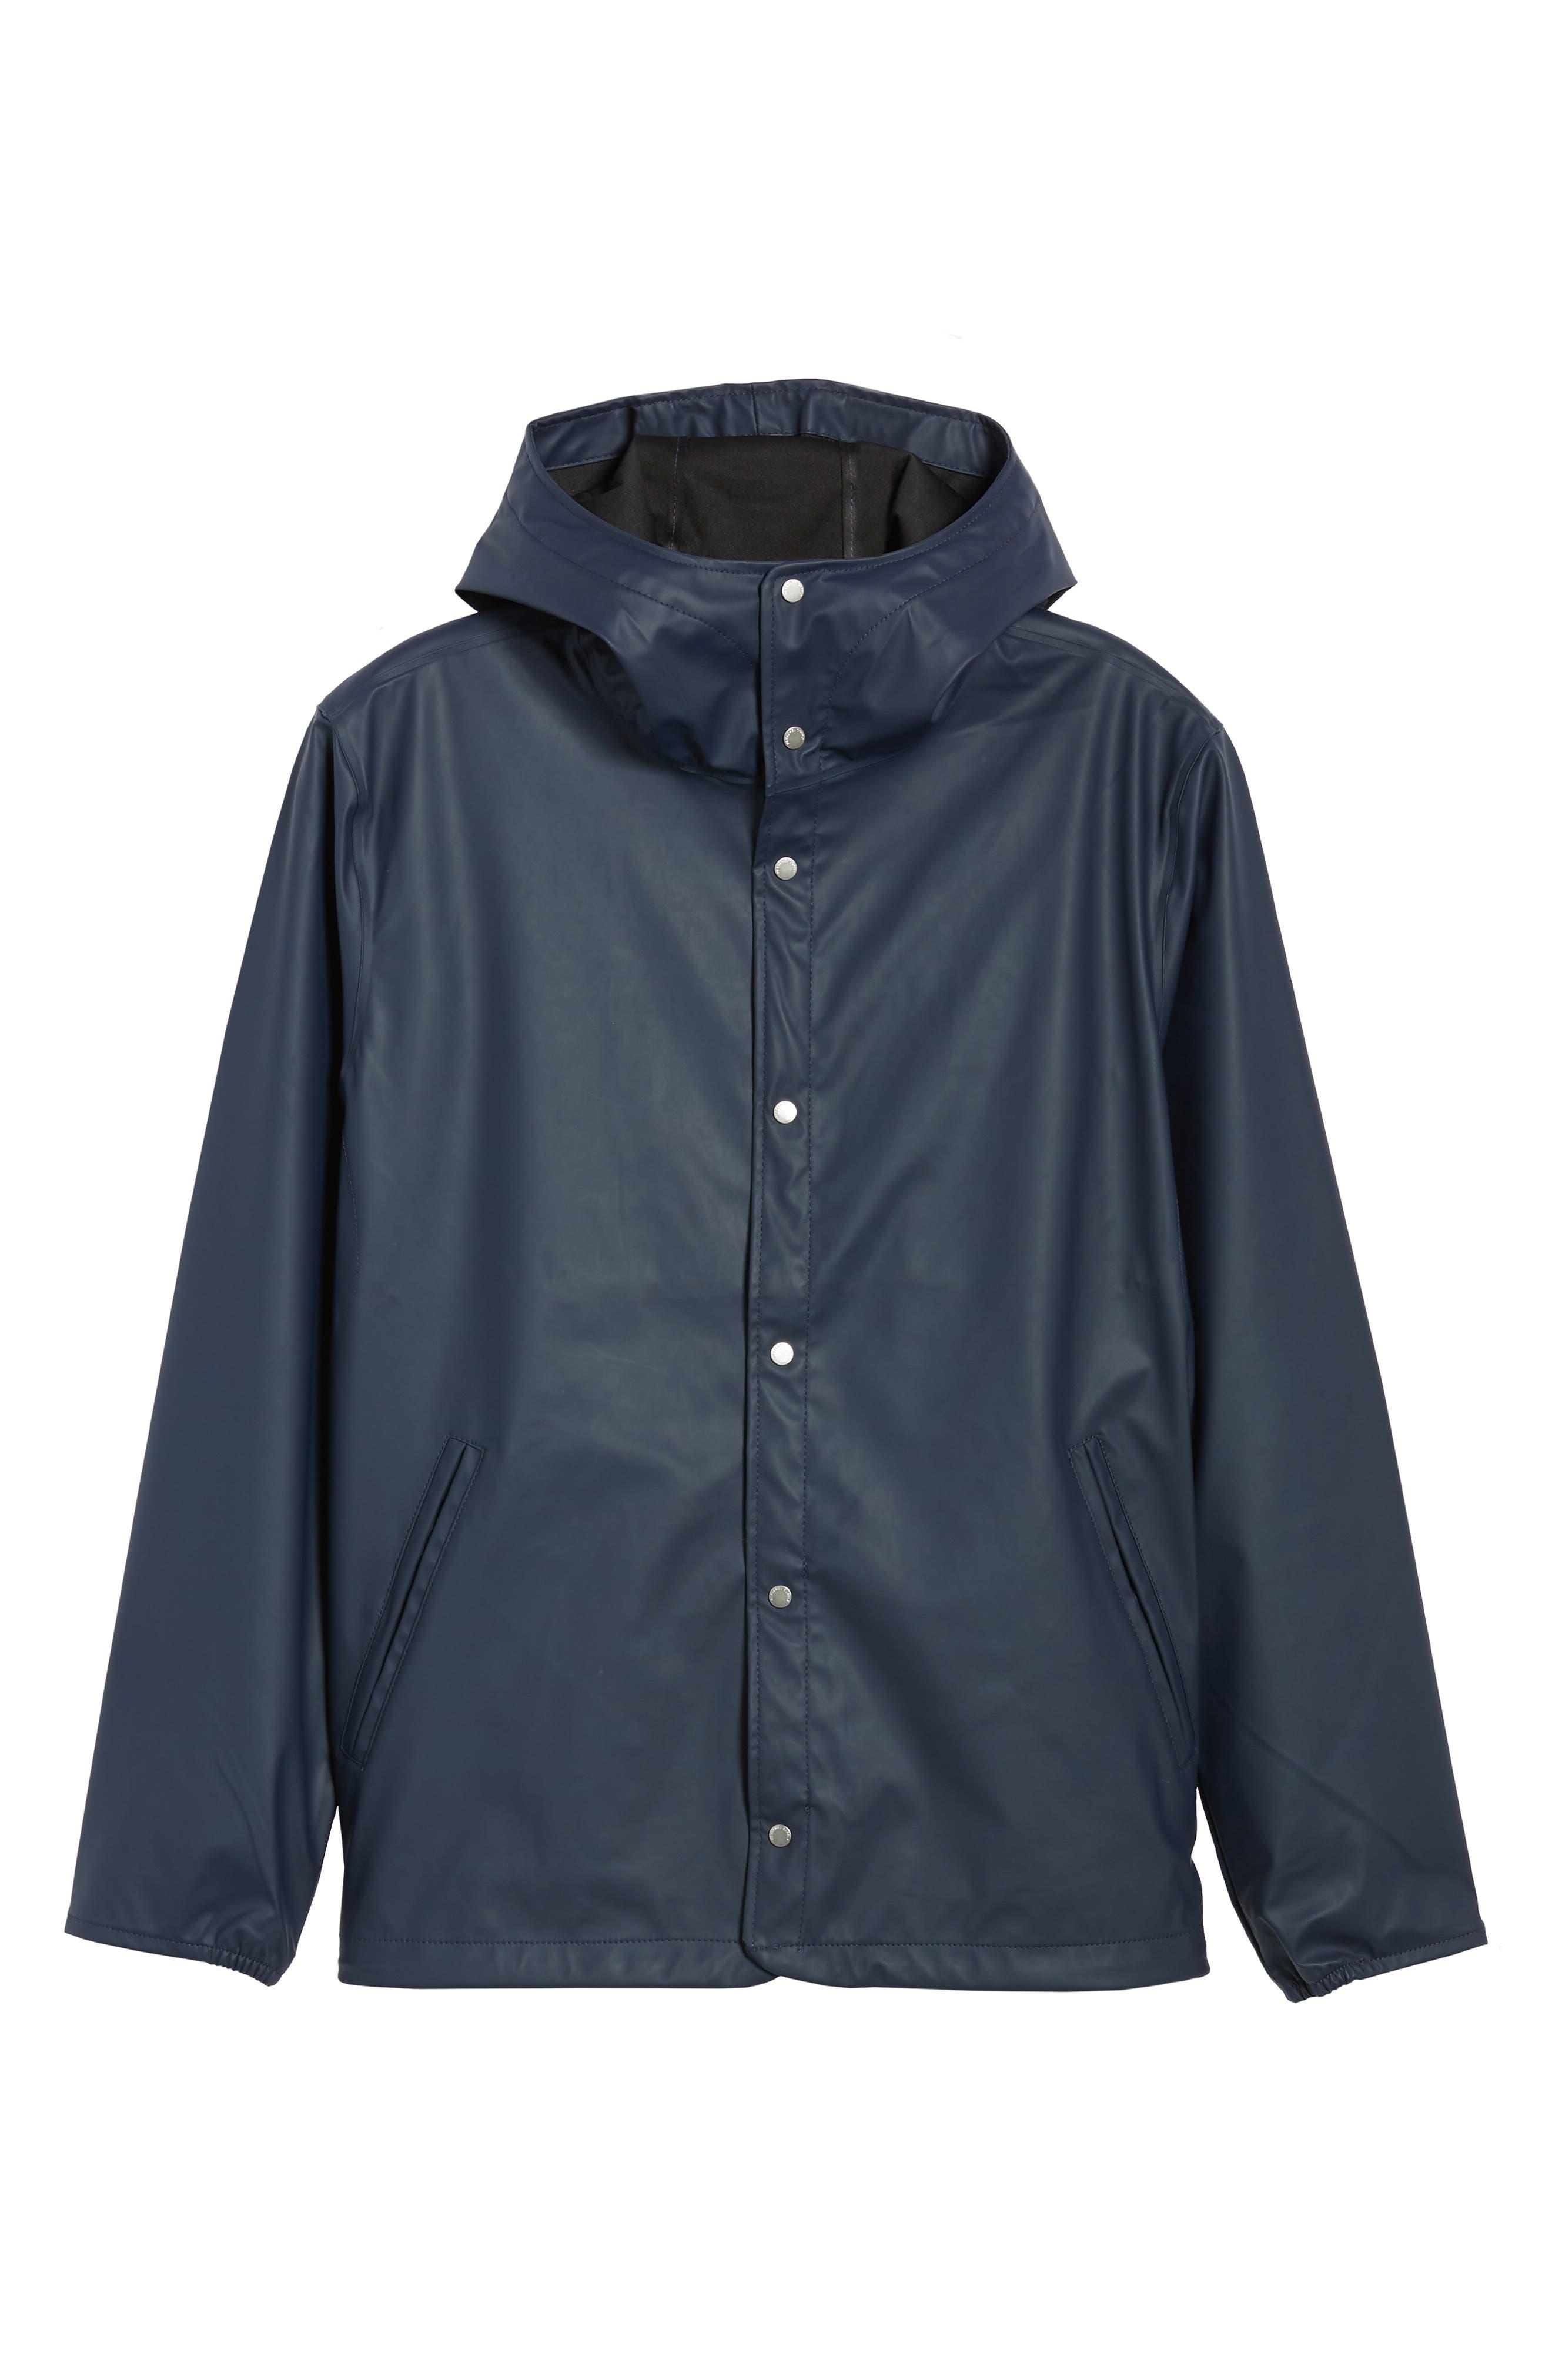 Forecast Hooded Coaches Jacket,                             Main thumbnail 1, color,                             Peacoat/ Peacoat